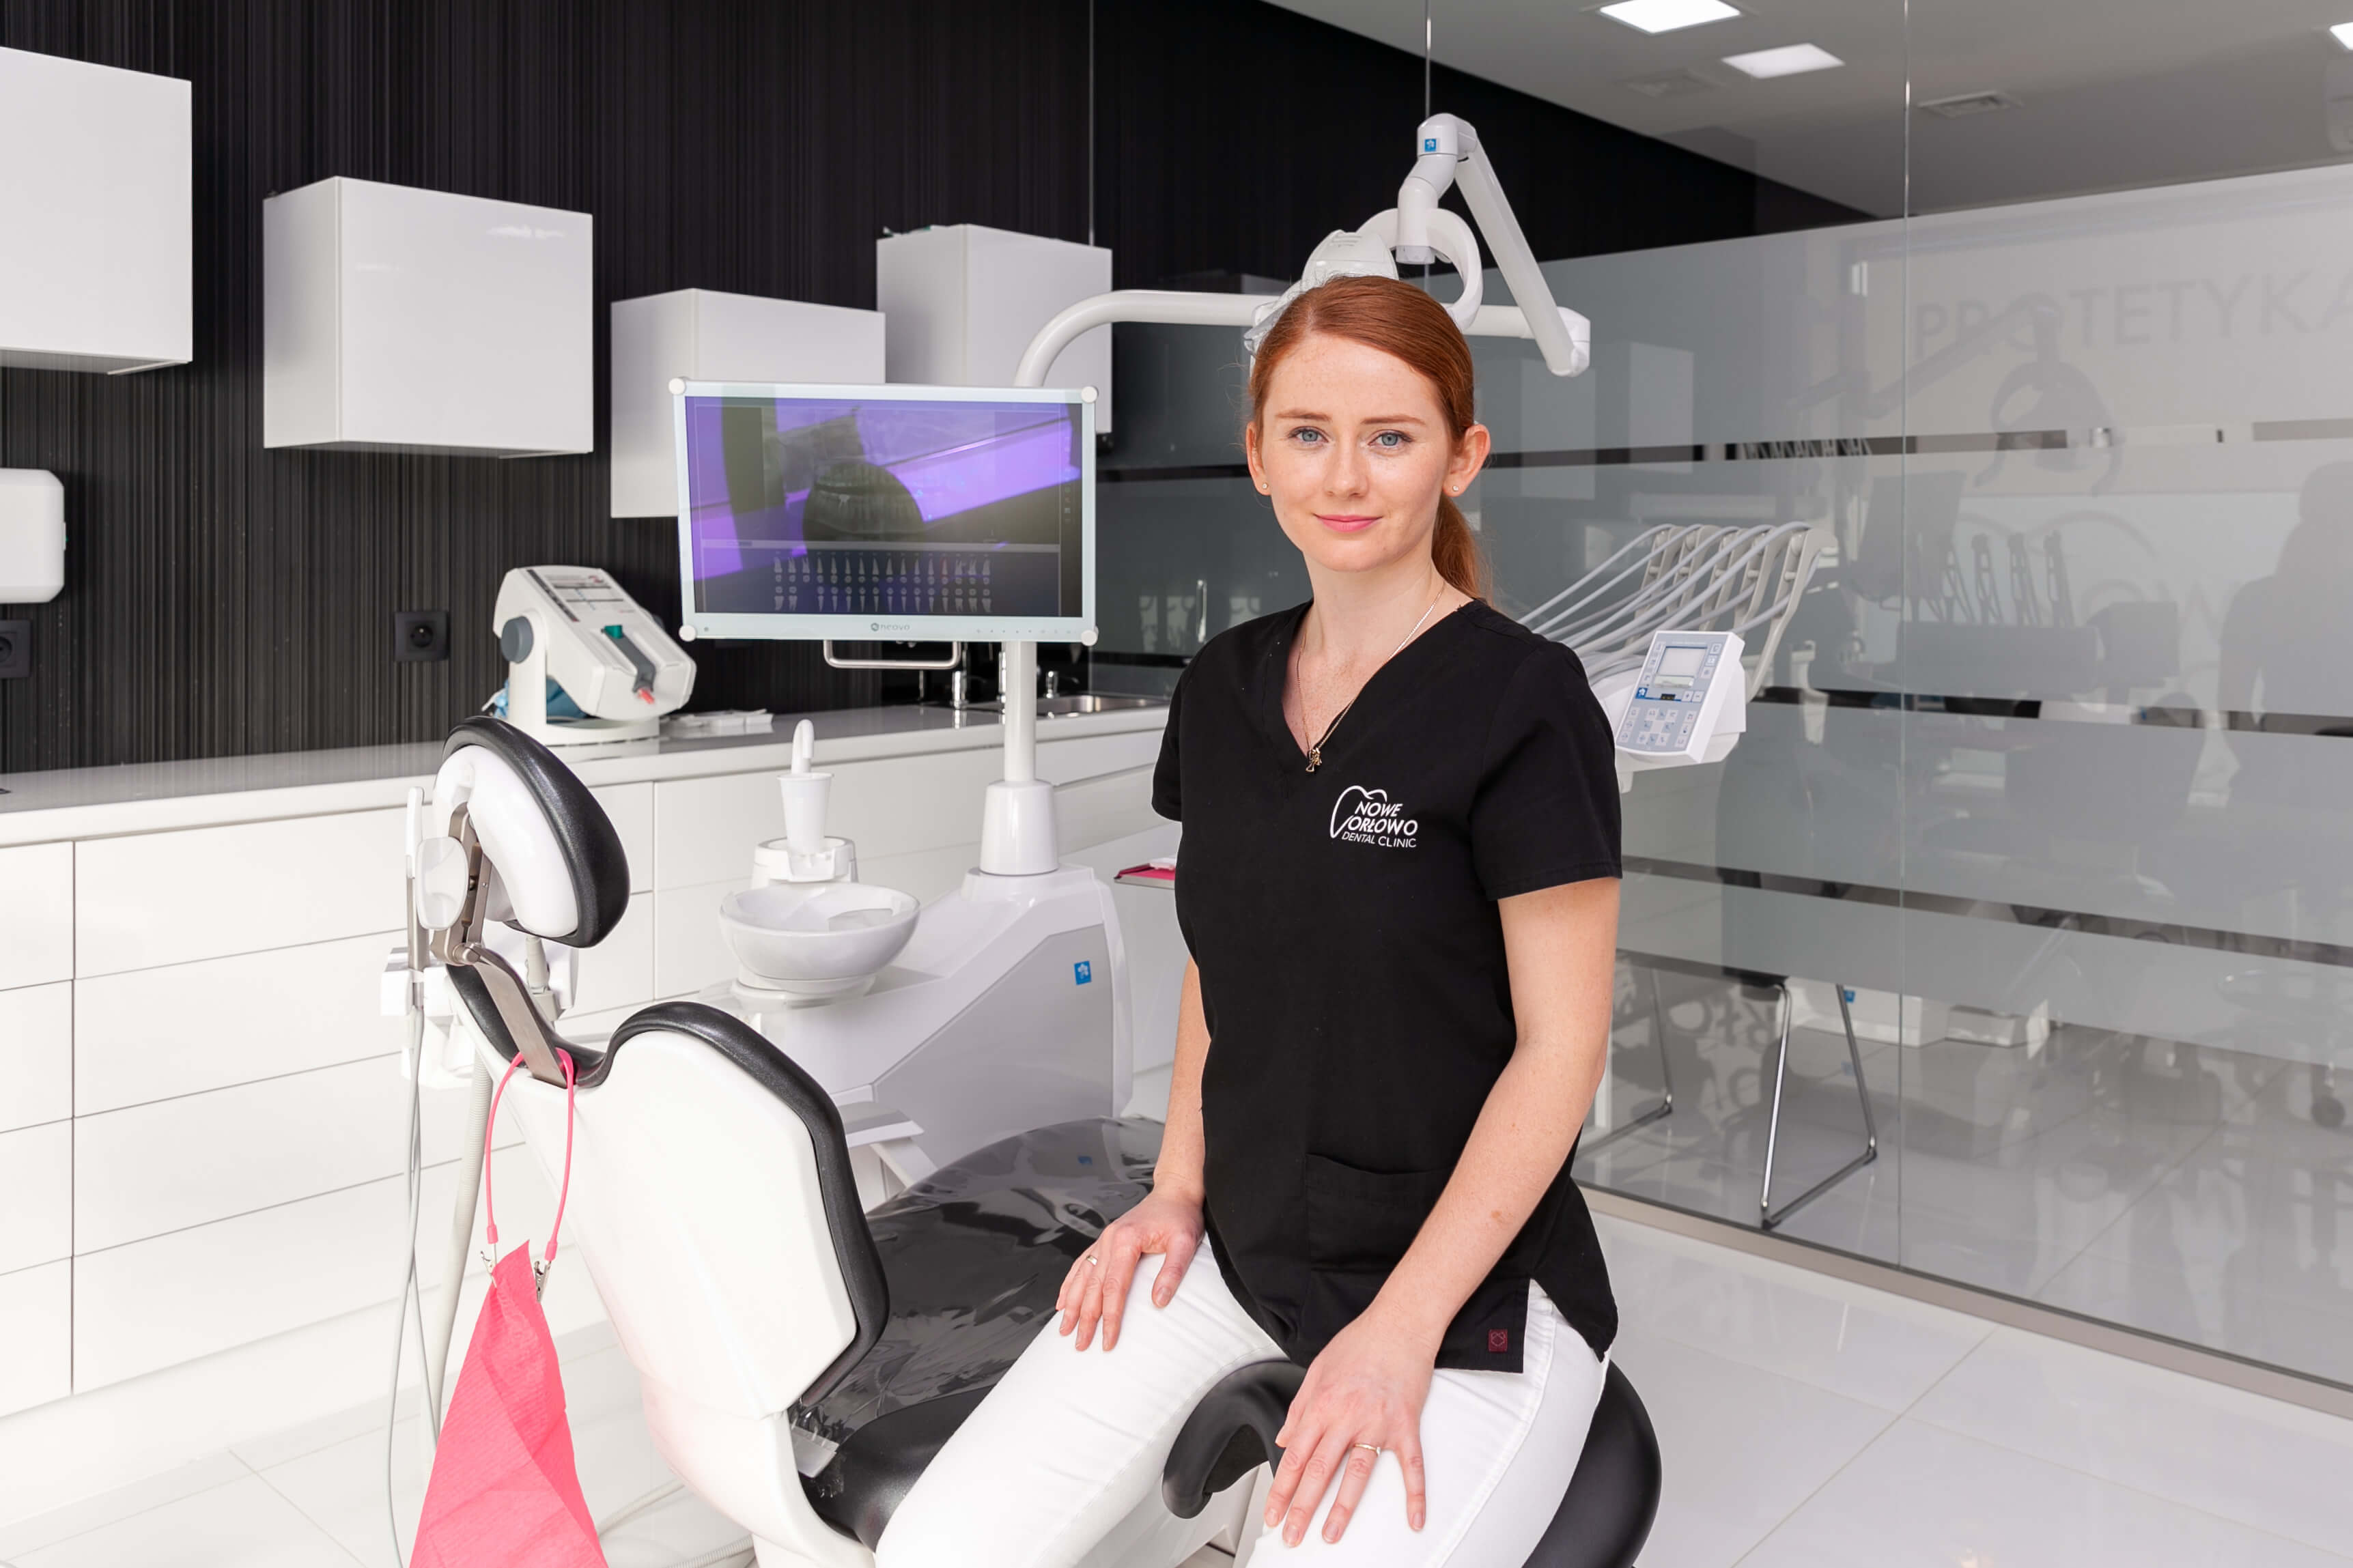 Nowe Orłowo Dental clinic 20 1 - Nowe Orłowo Dental Clinic - a clinic you can trust